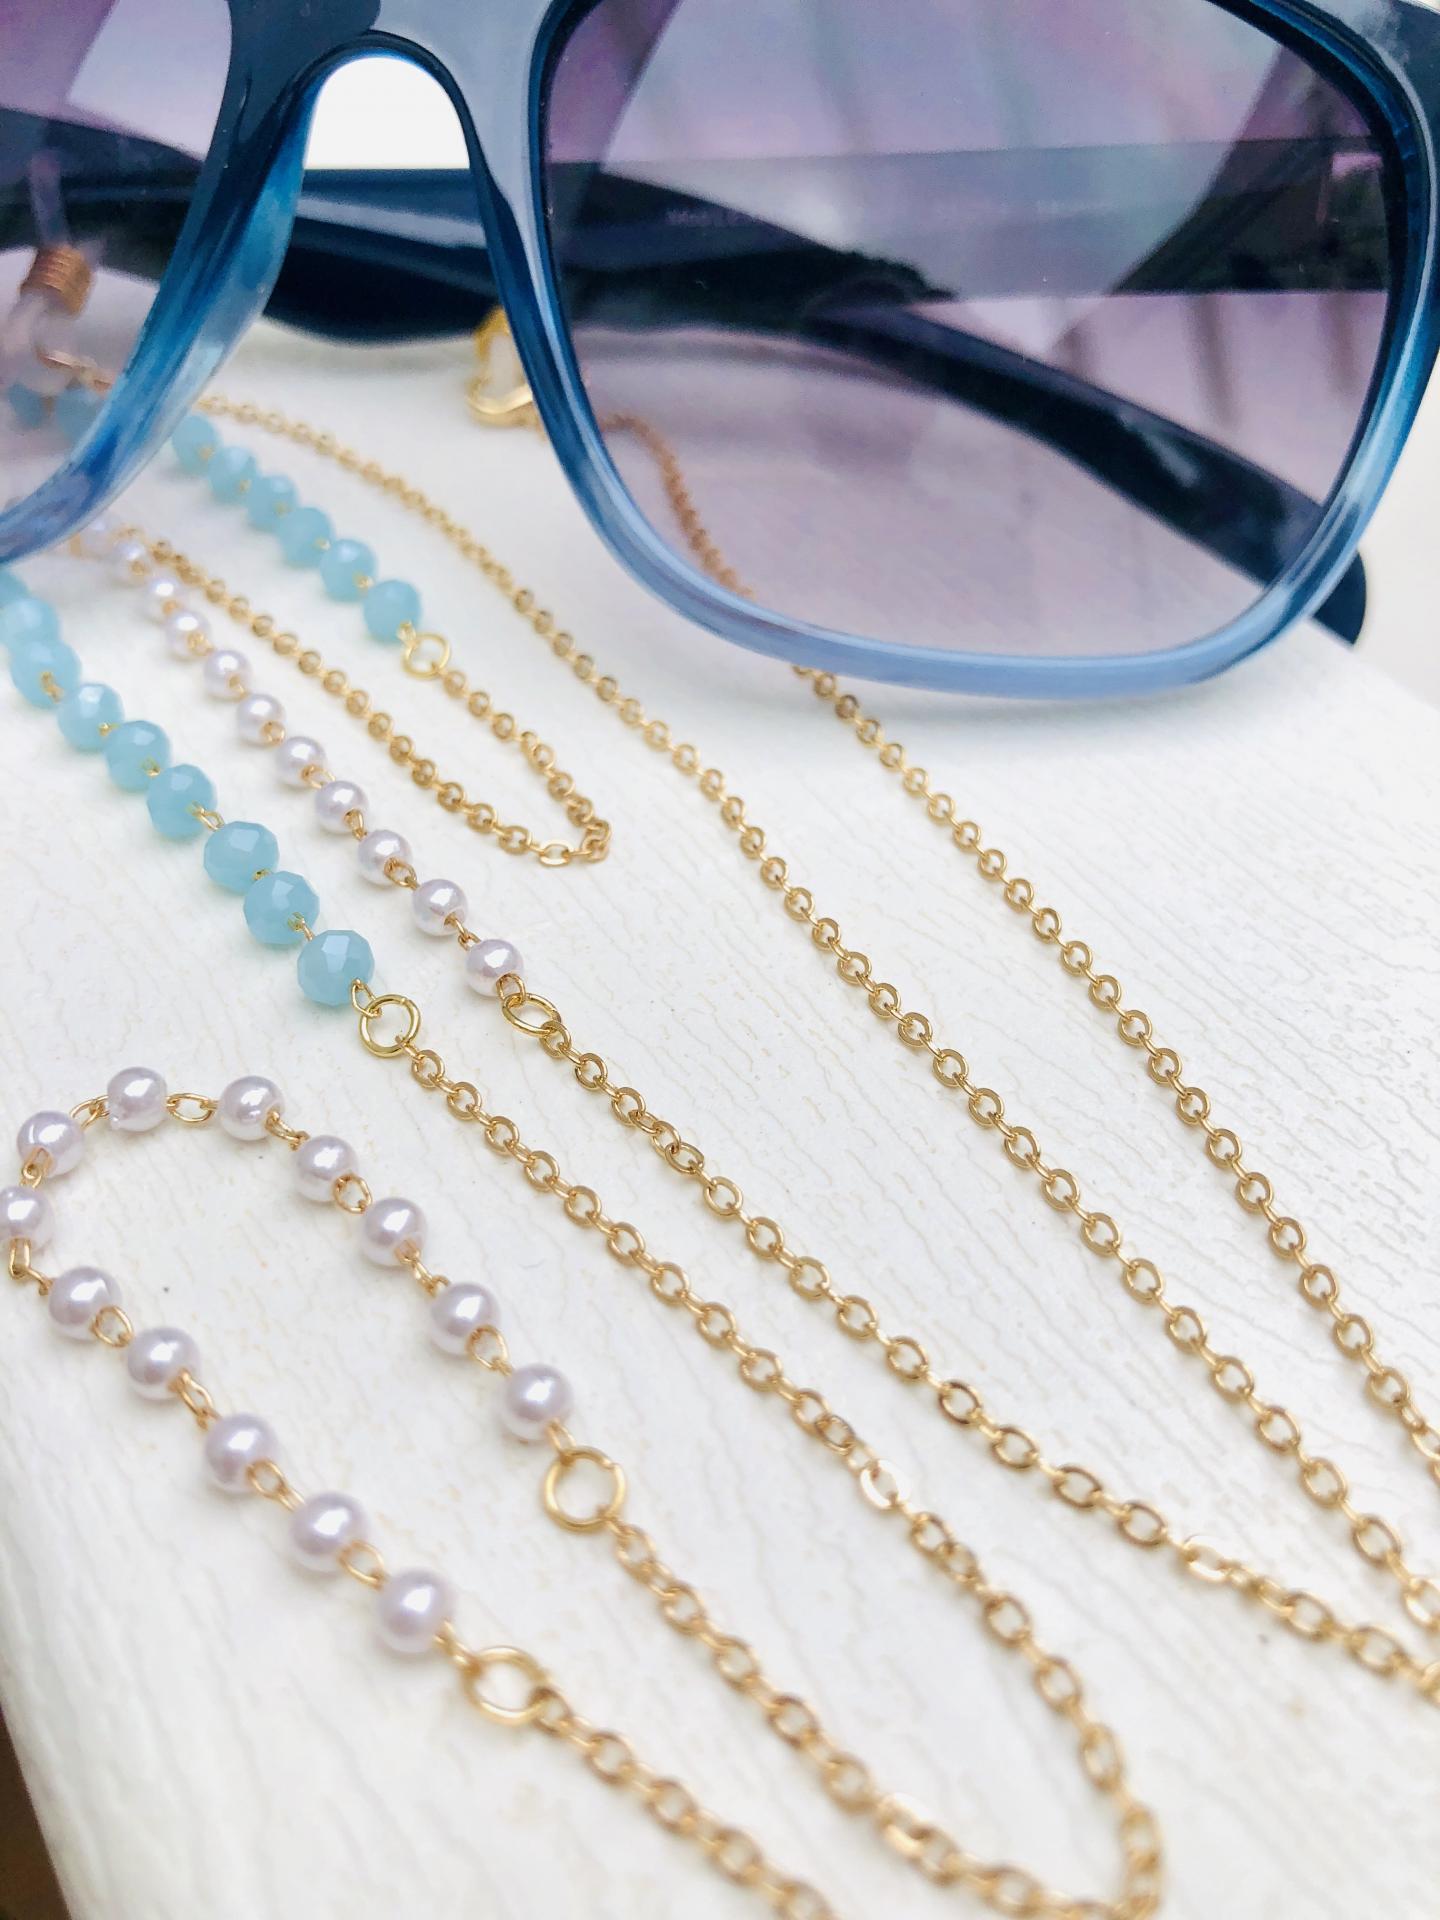 Cadena gafas de acero dorado, bolitas de strass color celeste y perlas blancas